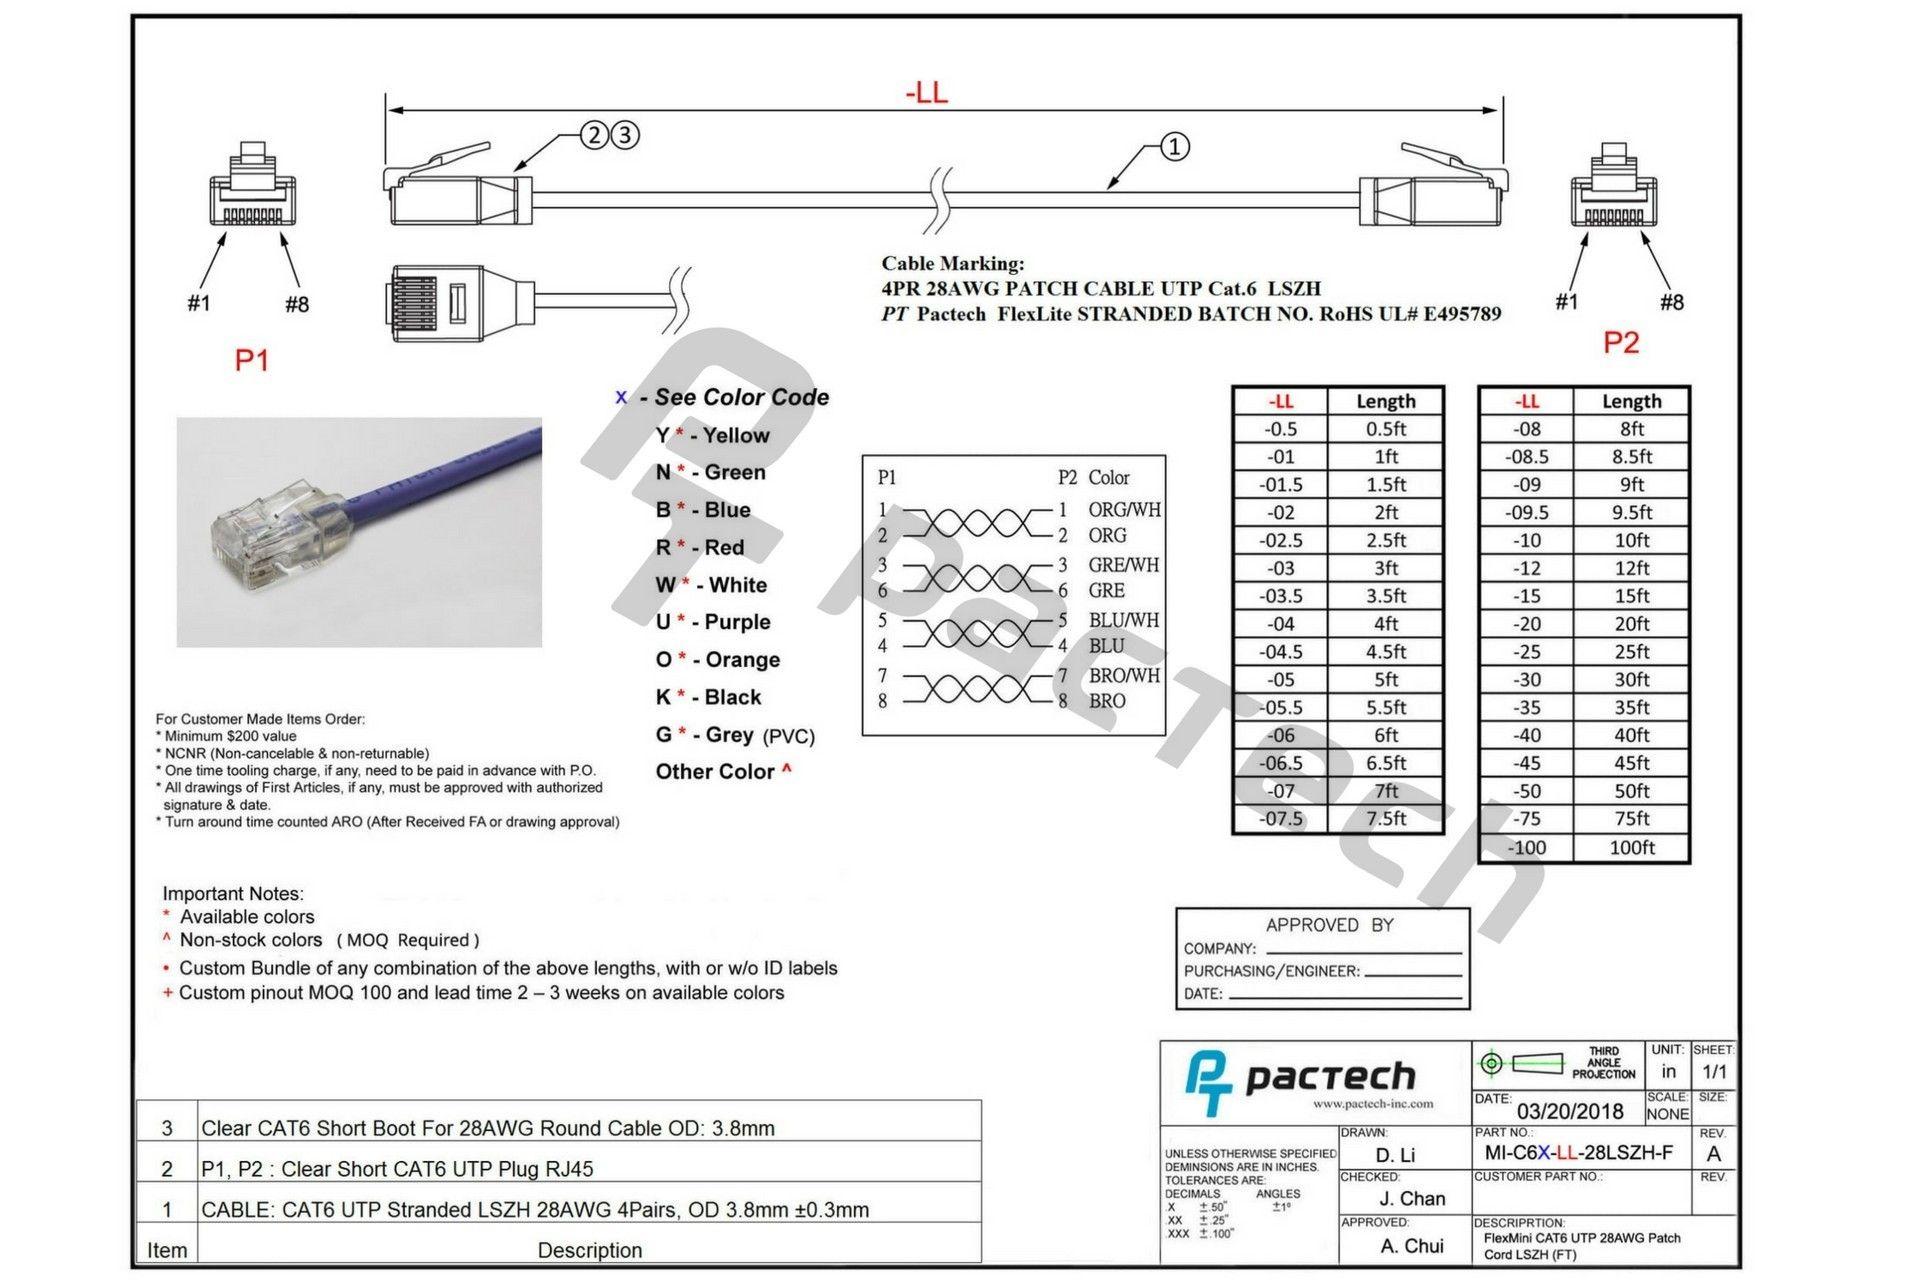 [DIAGRAM] Cat 6 Wiring Diagram Rj11